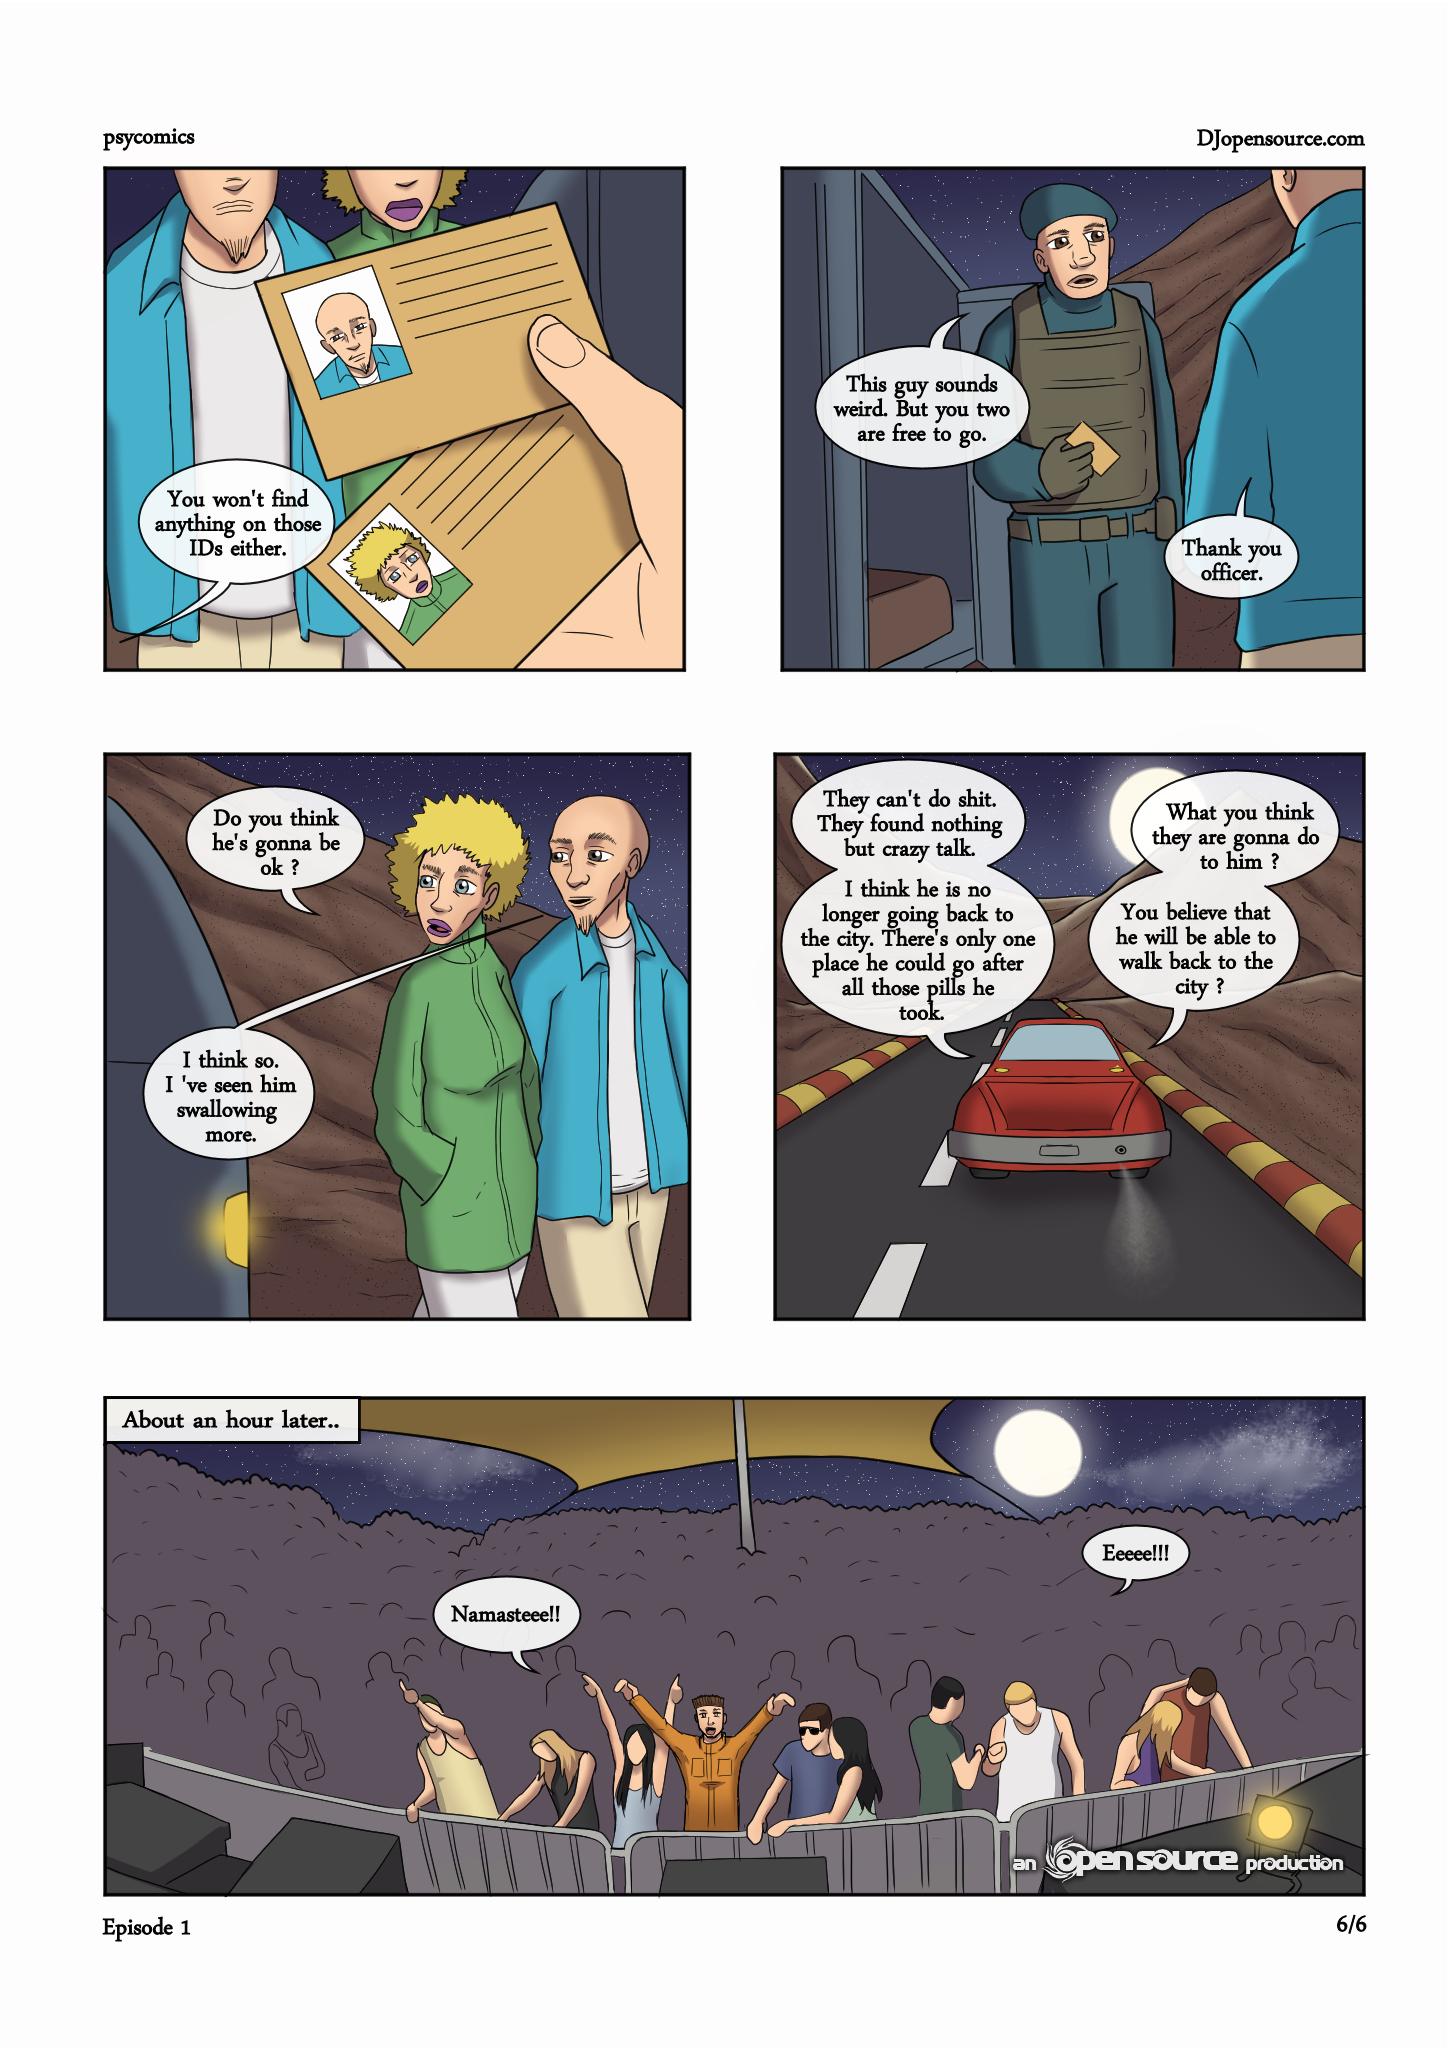 psycomics_episode_1_page_6.jpg